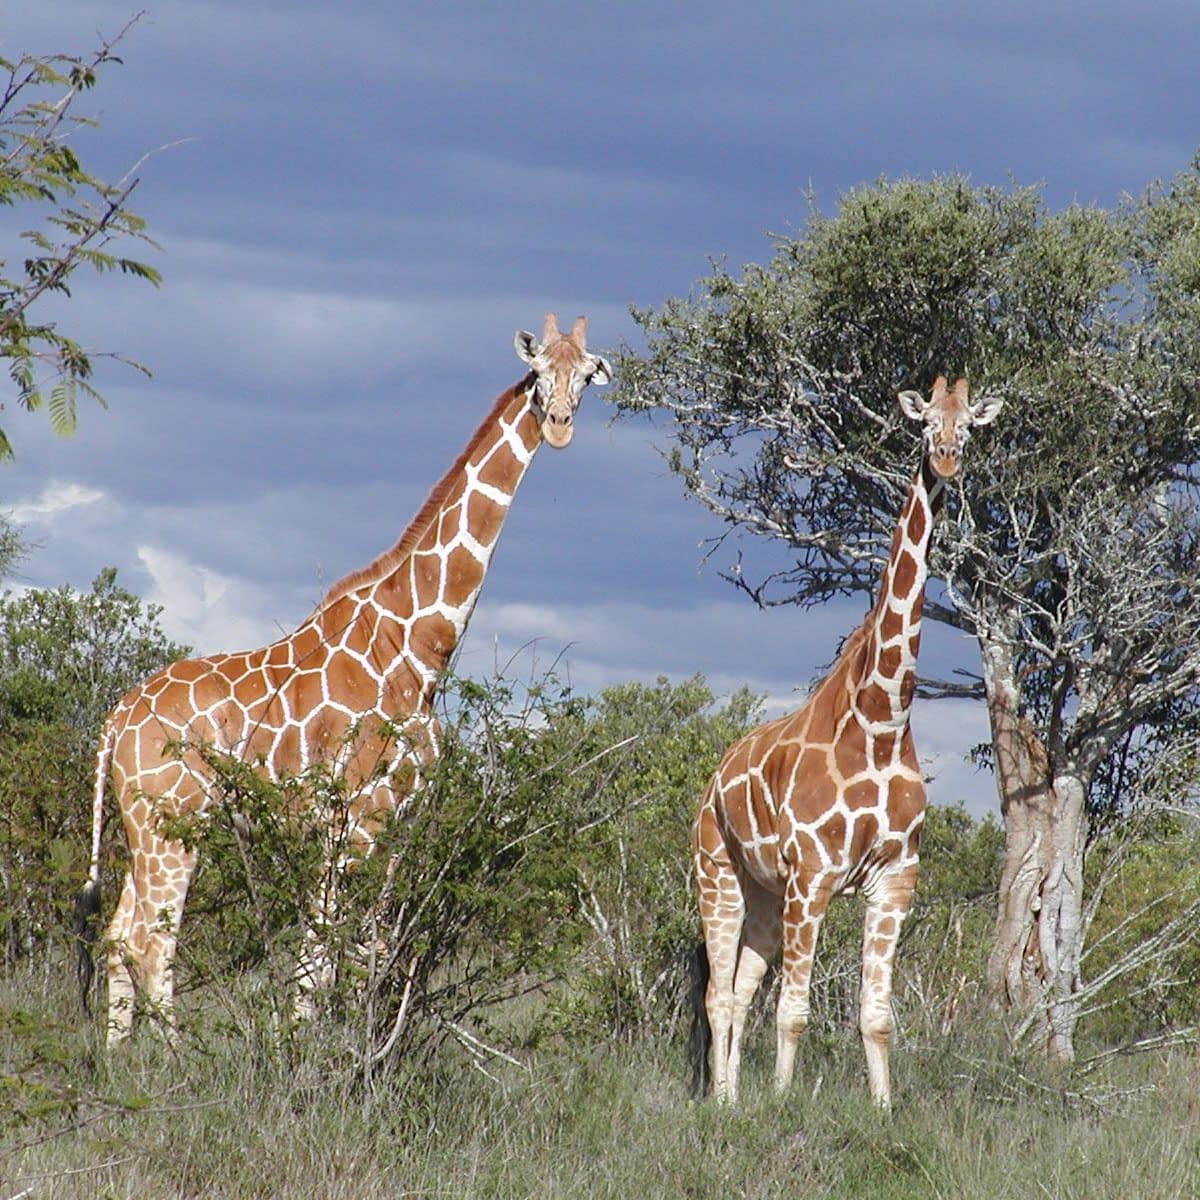 2 giraffe stood by a tree looking at camera